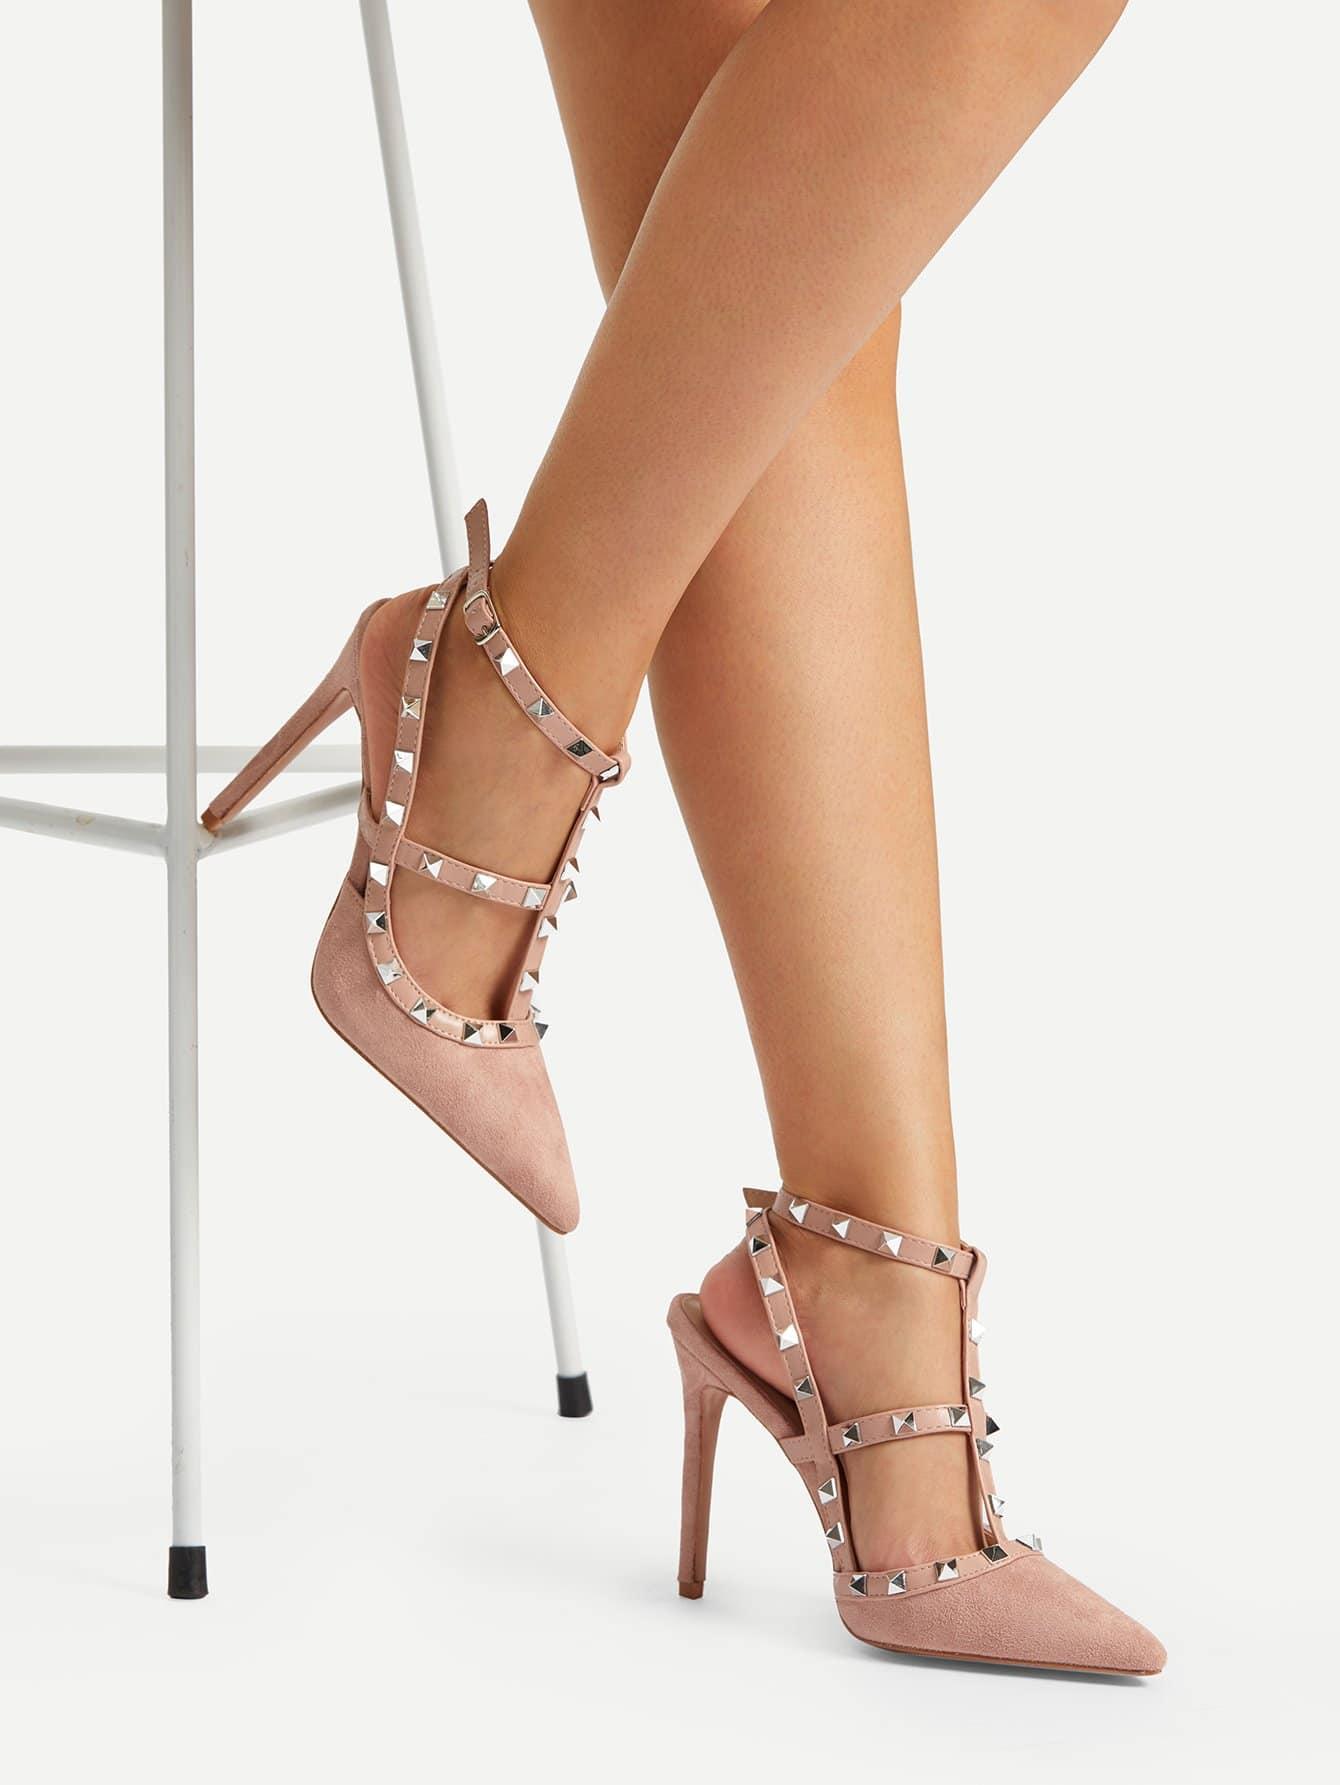 History of high heels fashion